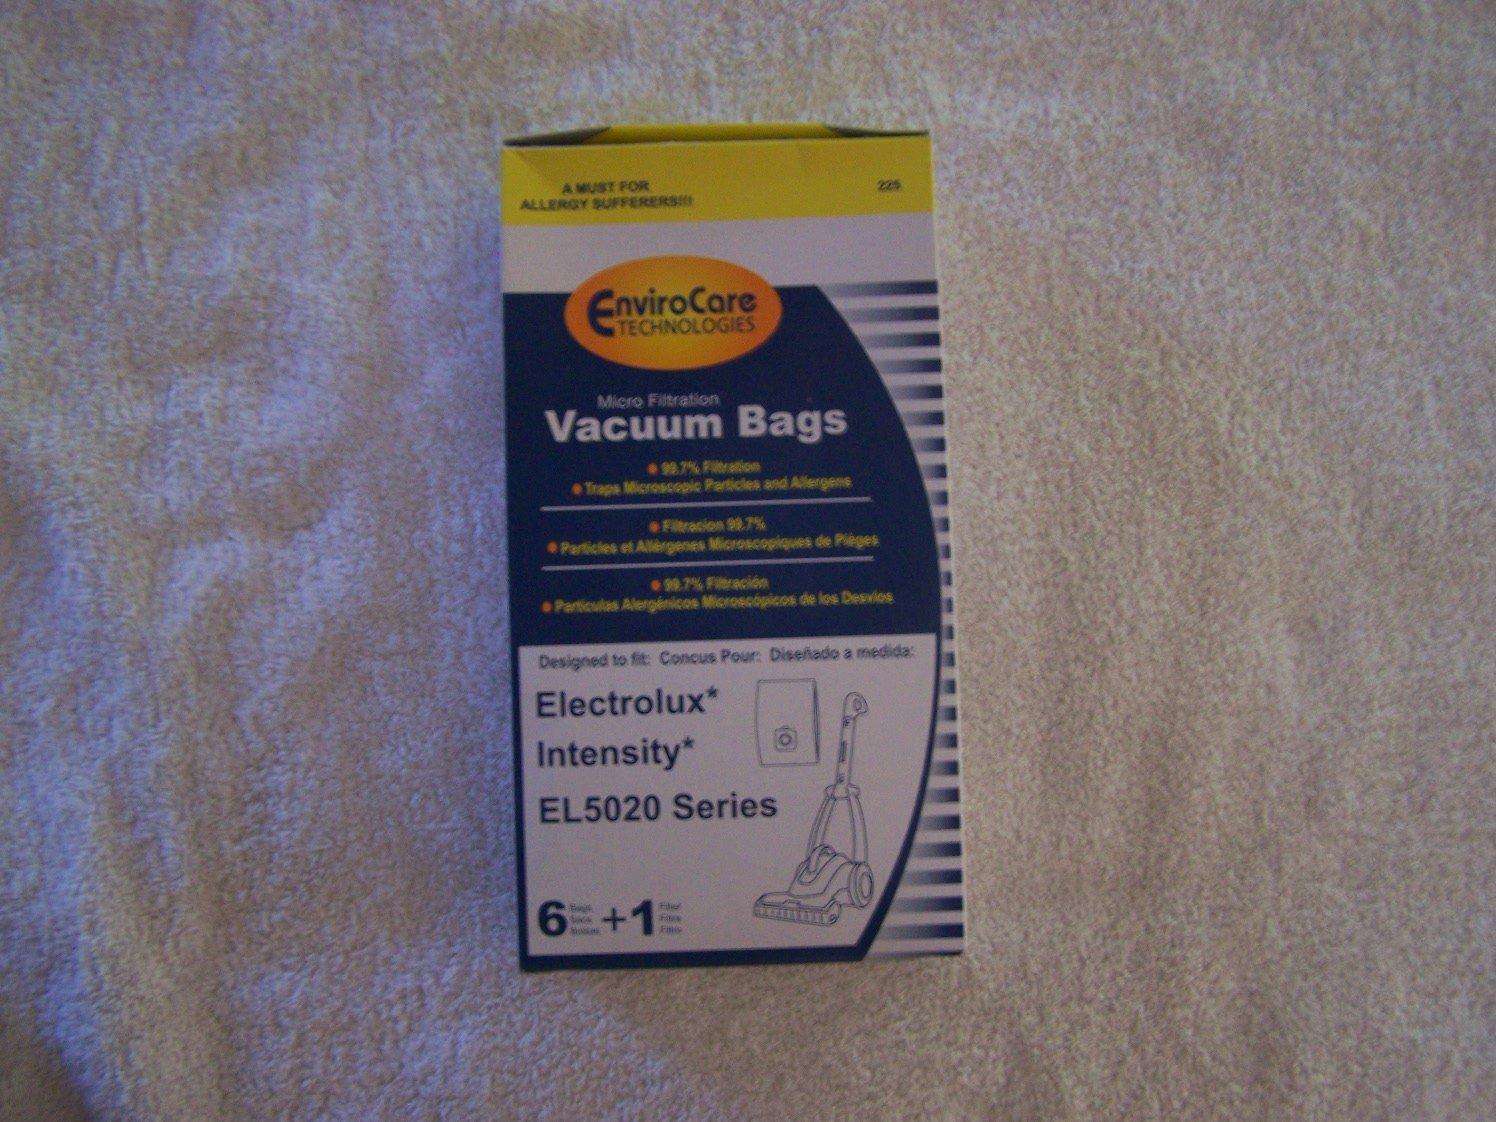 Electrolux Intensity EL5020 Series Micro Filtration Vacuum Bags 6 bags + 1 filter by EnviroCare